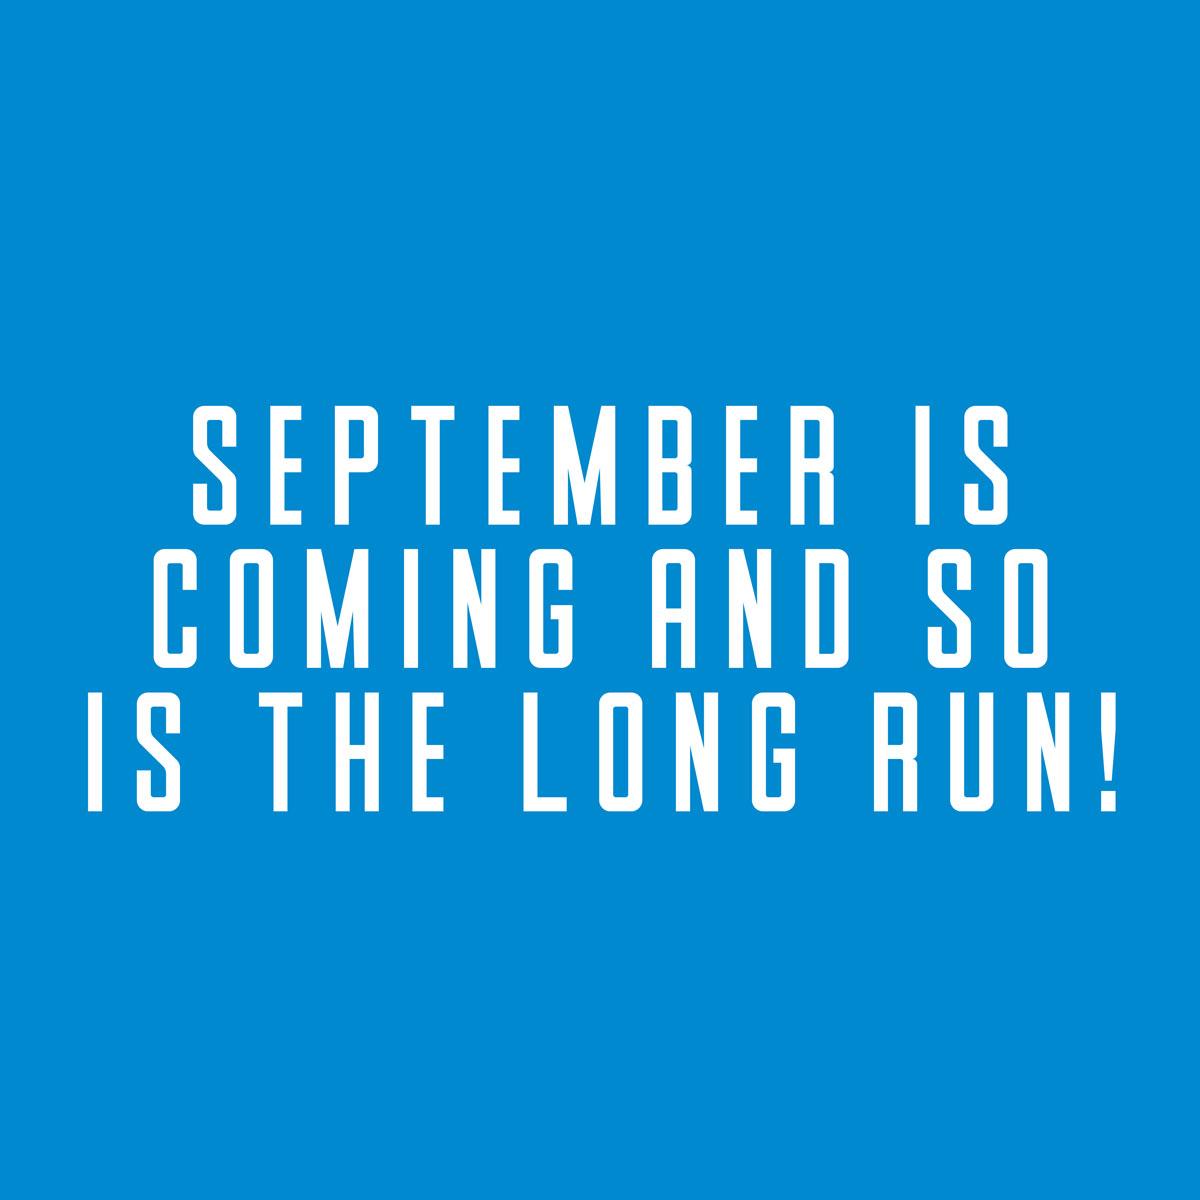 September is coming! (Instagram)